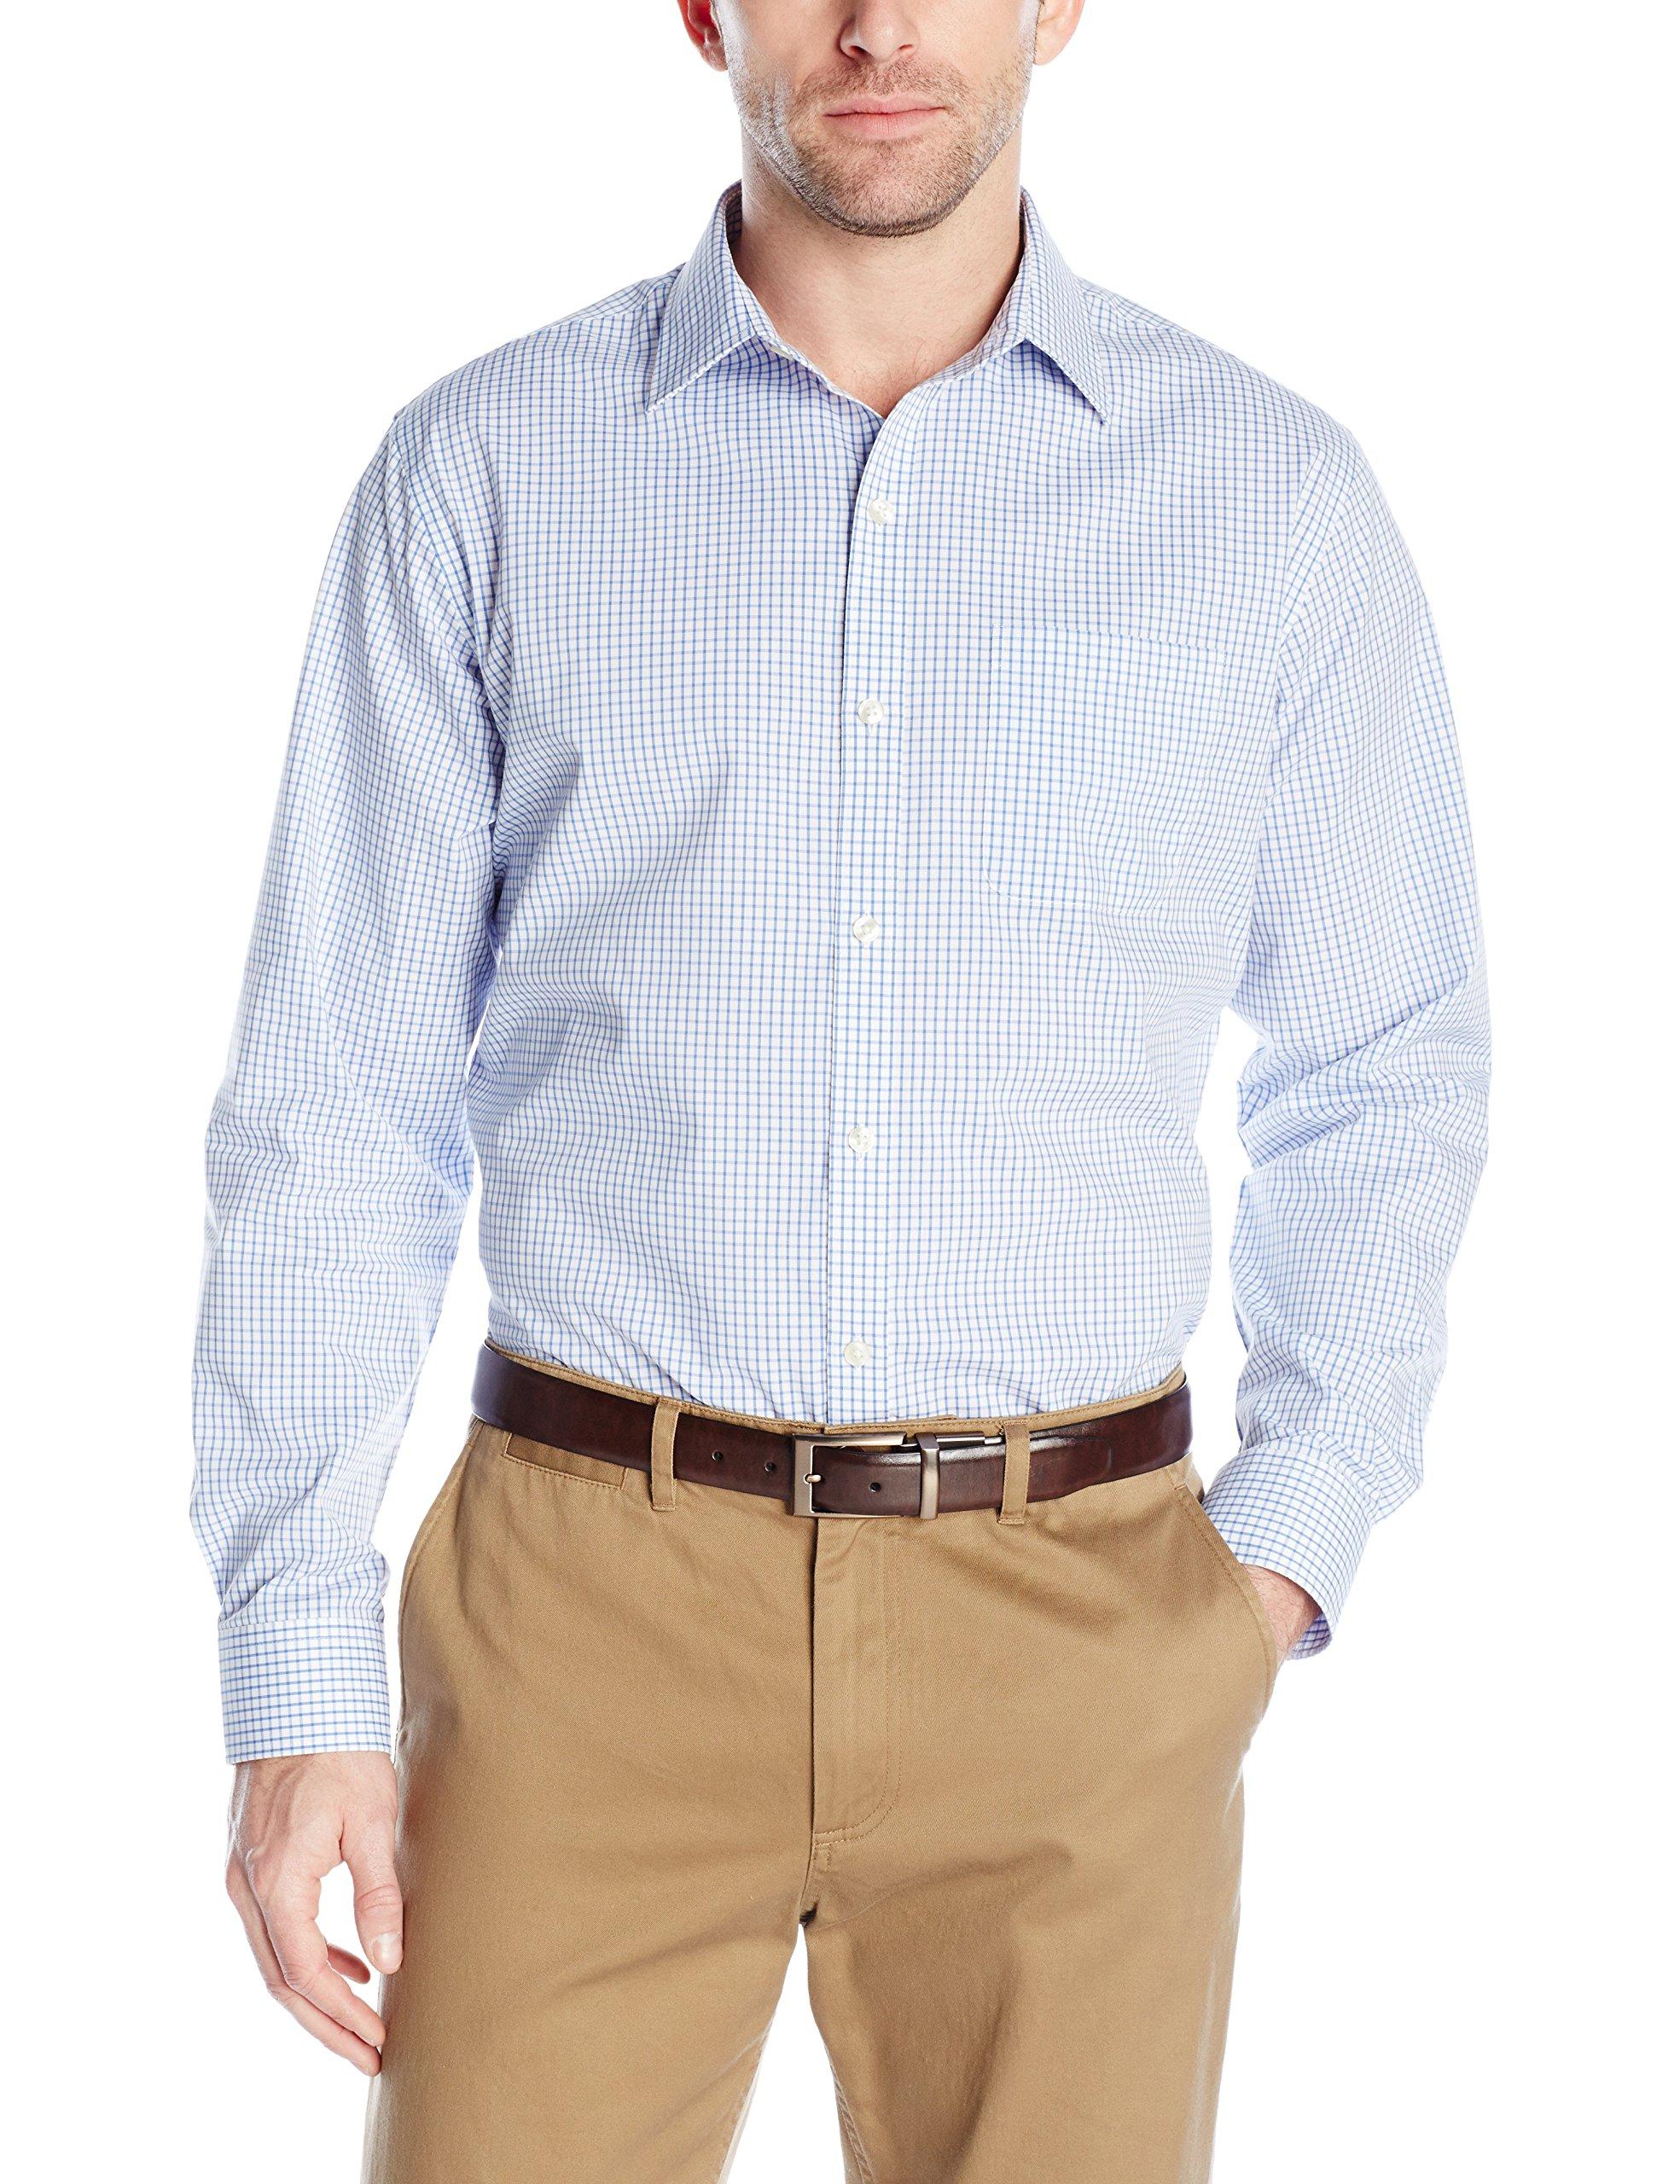 Van Heusen Men's Long Sleeve Traveler Stretch Non Iron Shirt, Pure Blue Crisp, Small